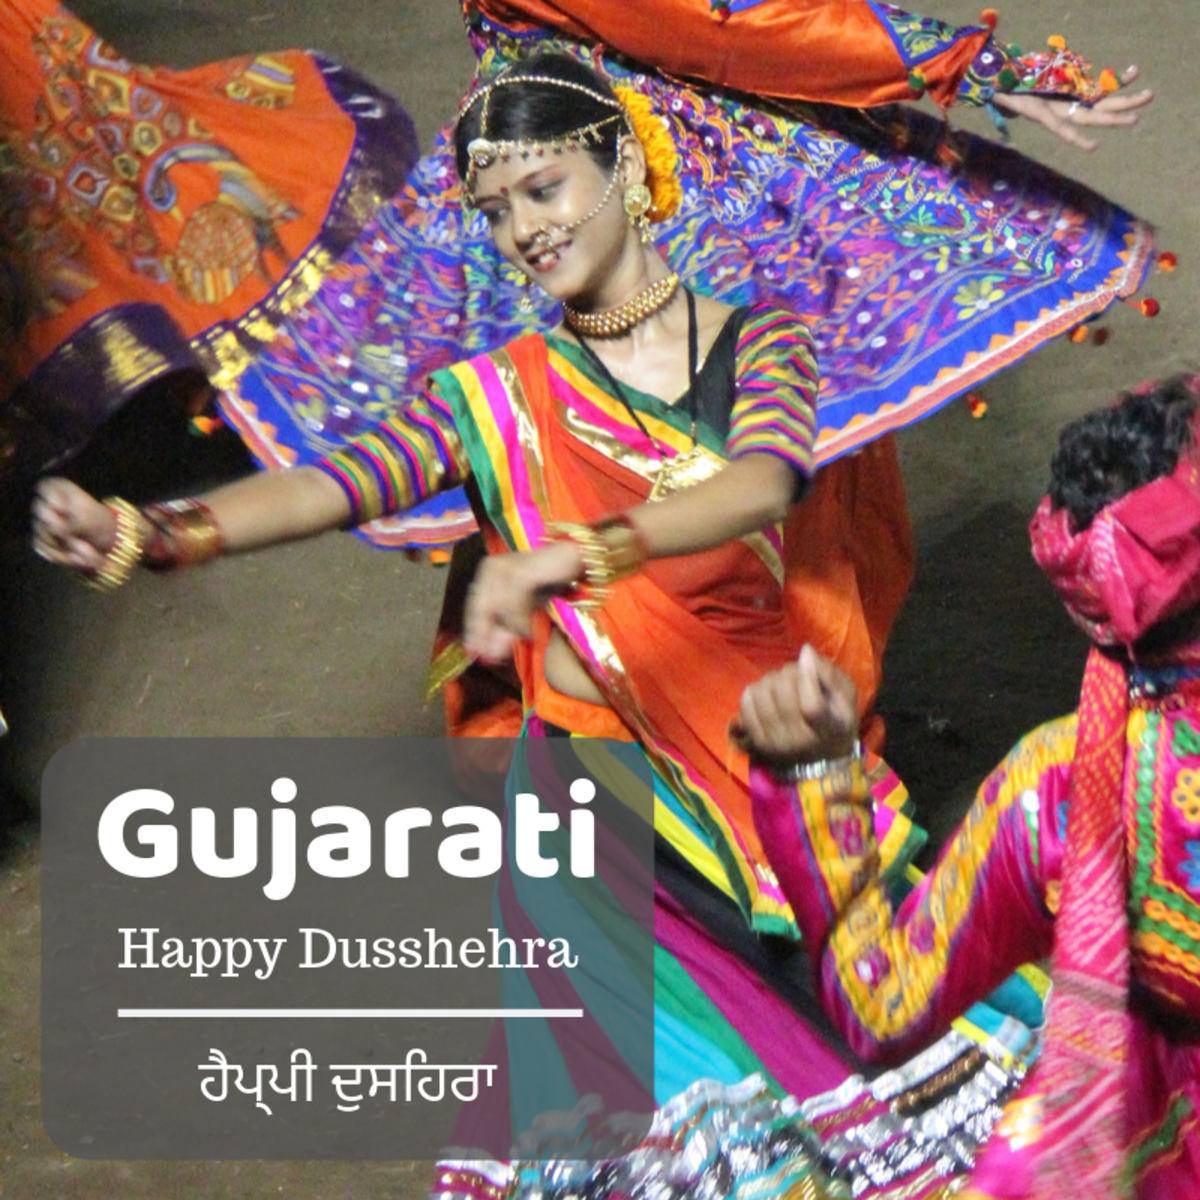 Happy Dusshehra—ਹੈਪ੍ਪੀ ਦੁਸਹਿਰਾ